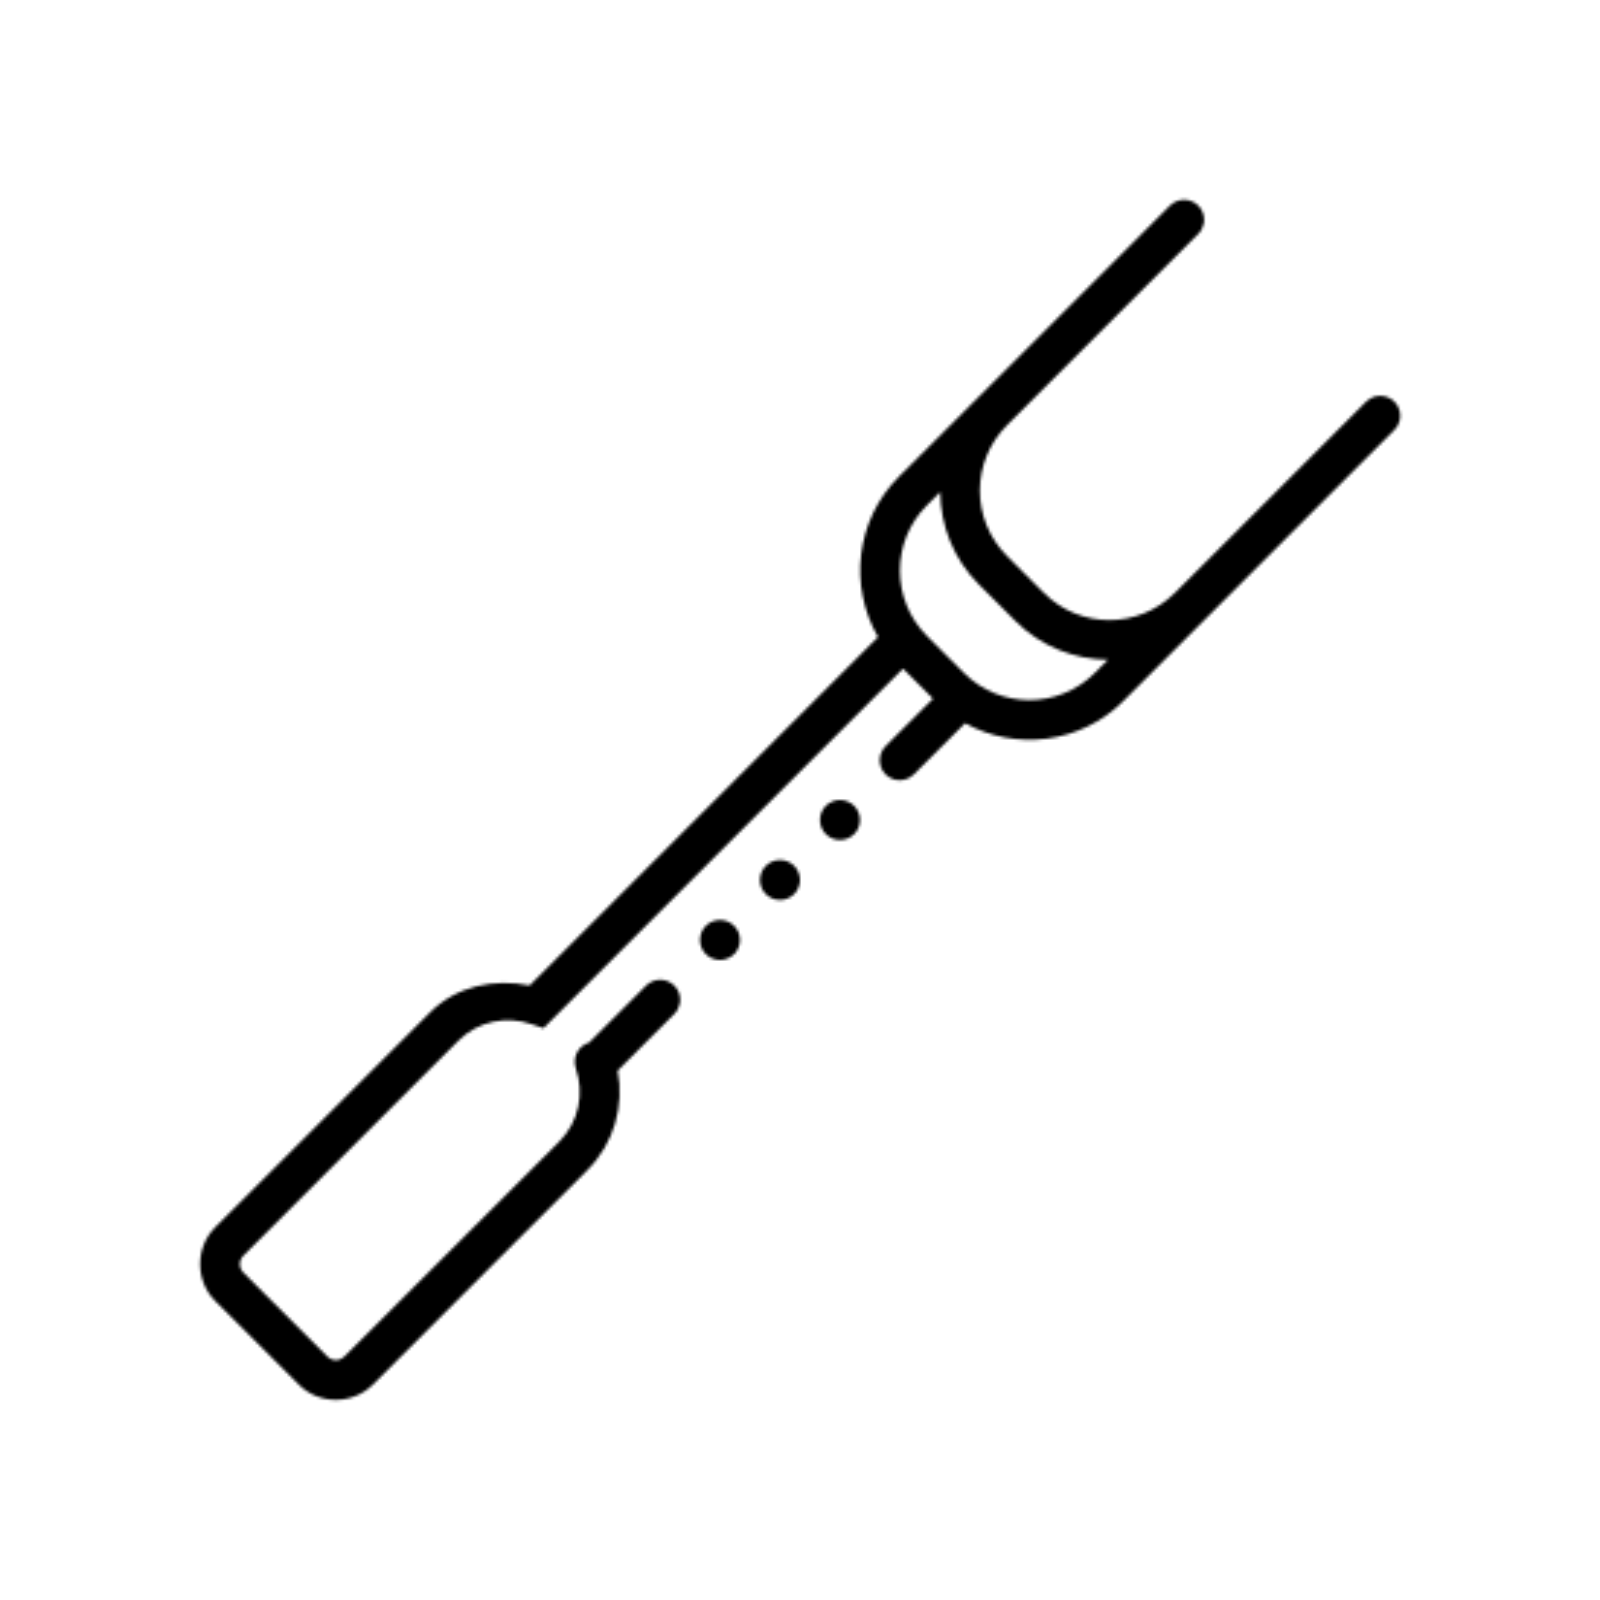 Big Fork icon